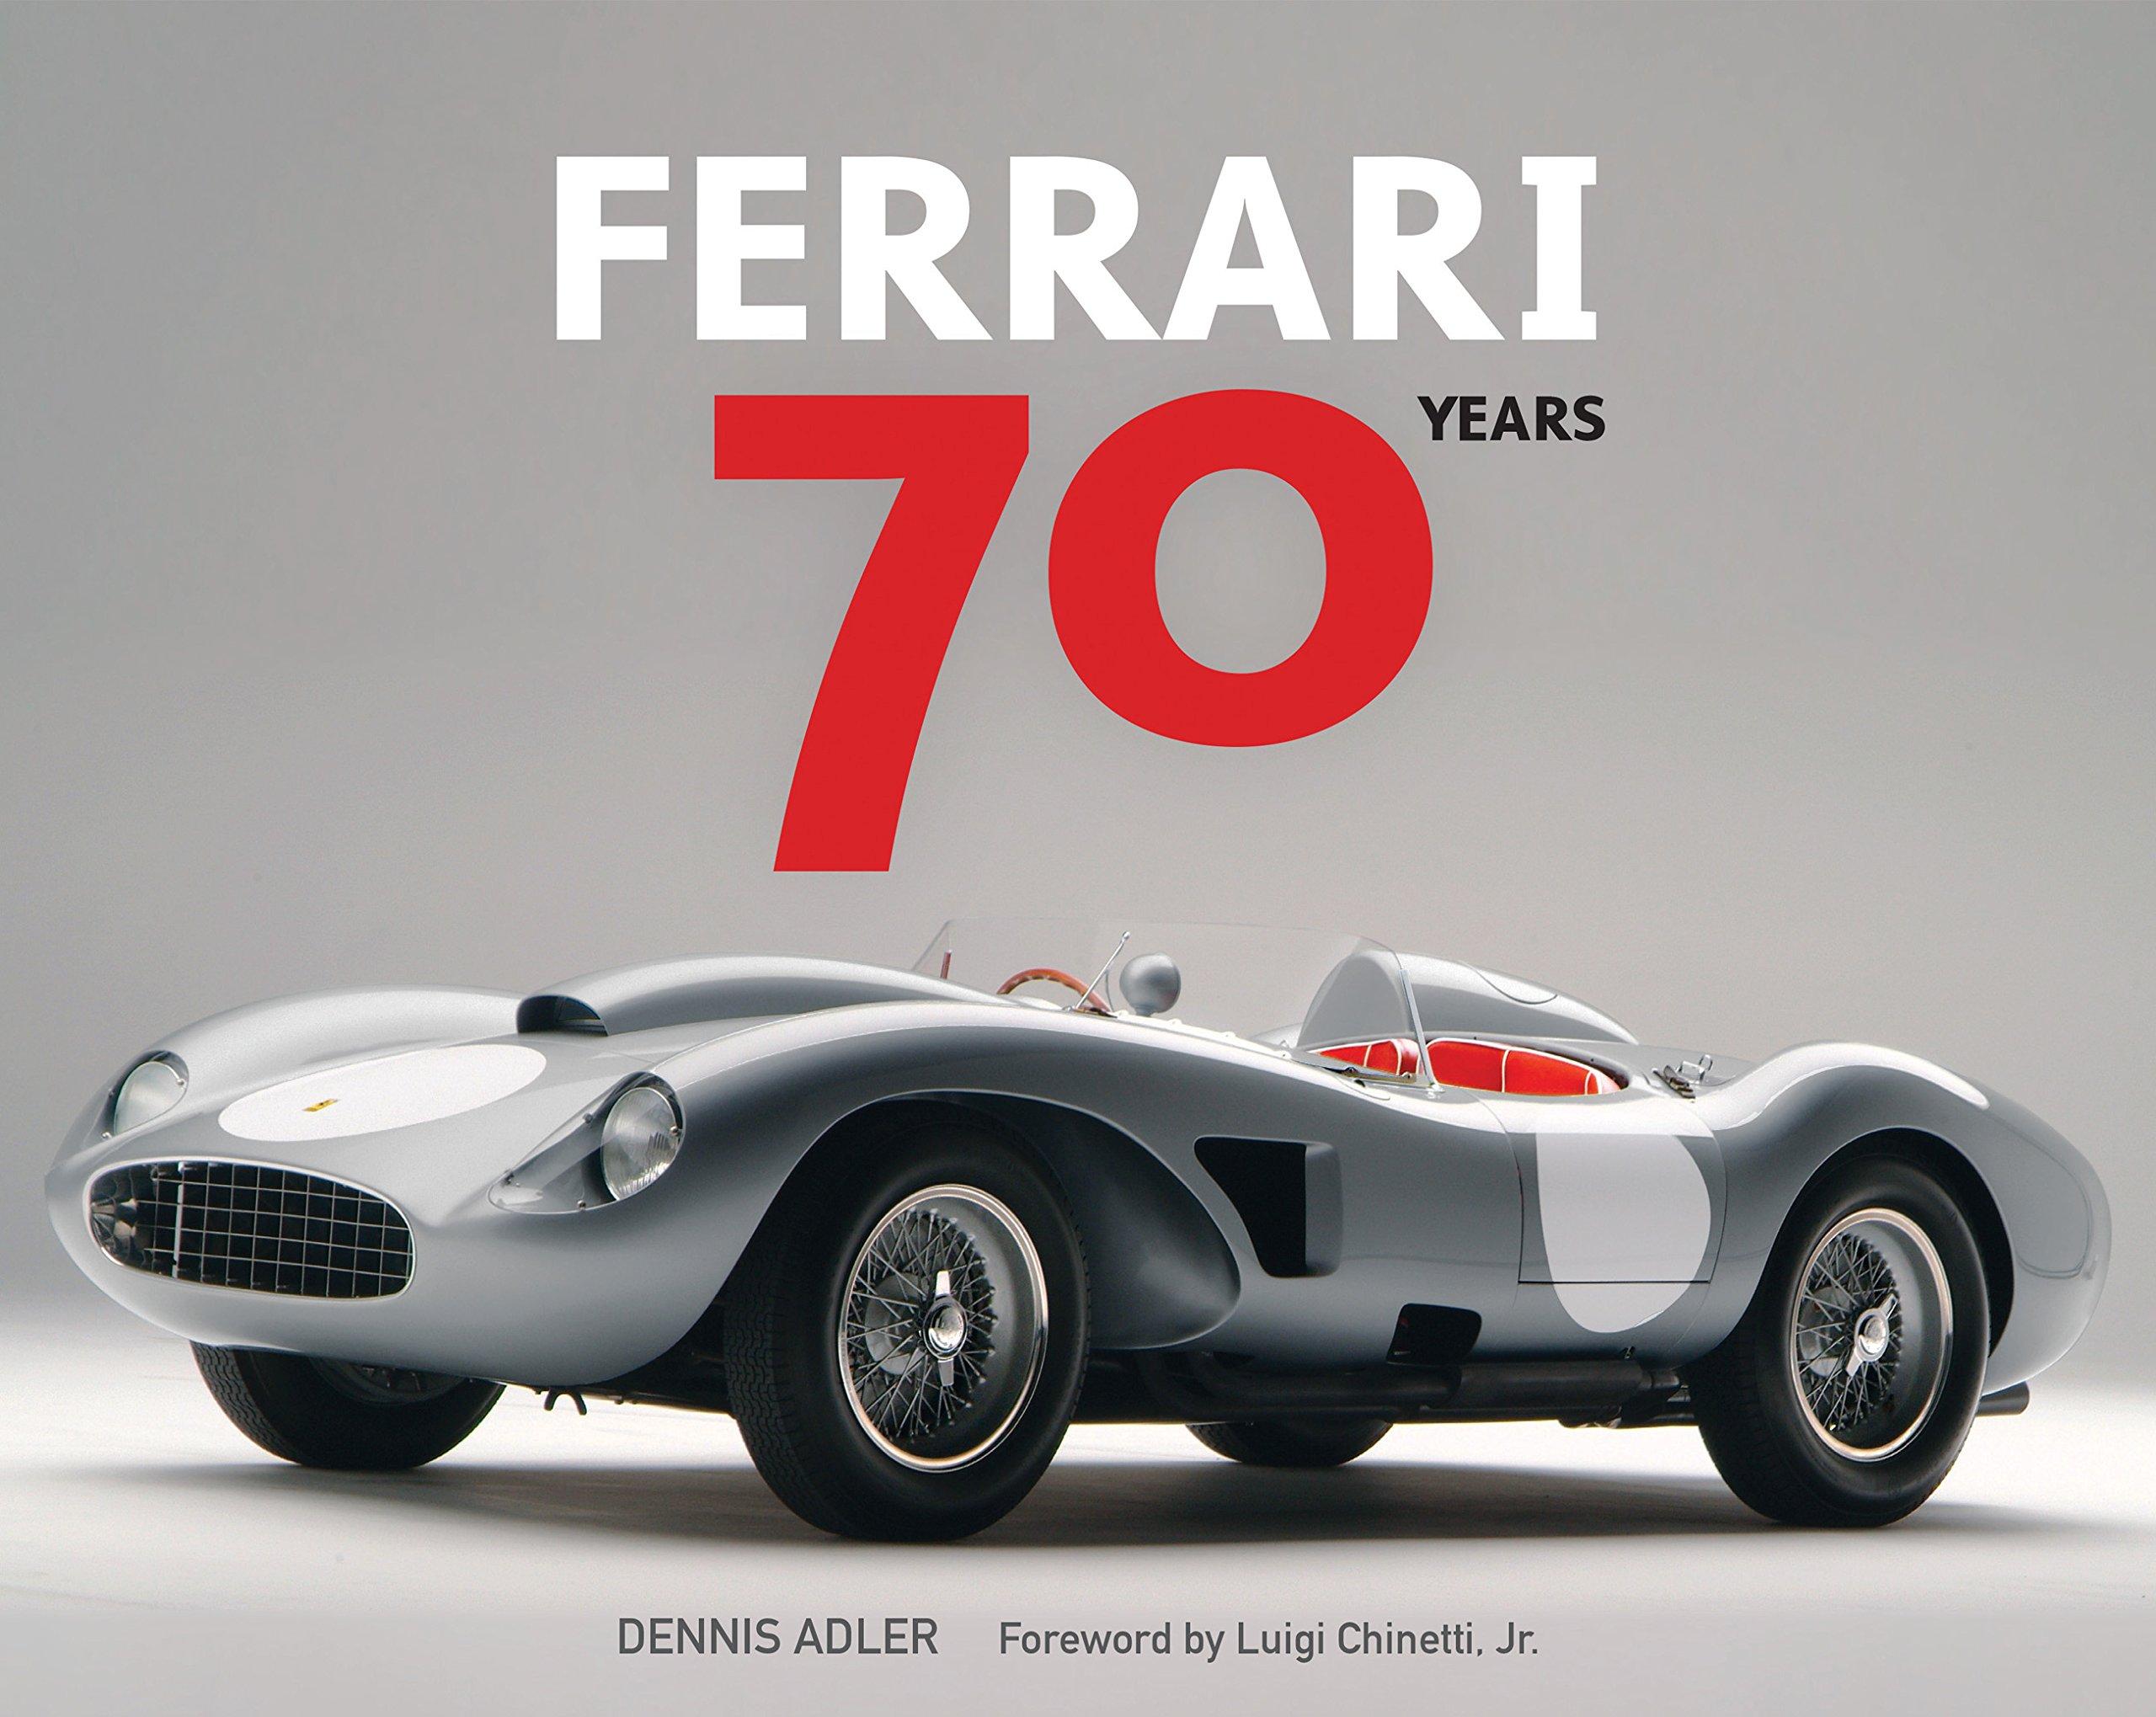 Ferrari 70 Years: Amazon.de: Dennis Adler: Fremdsprachige Bücher